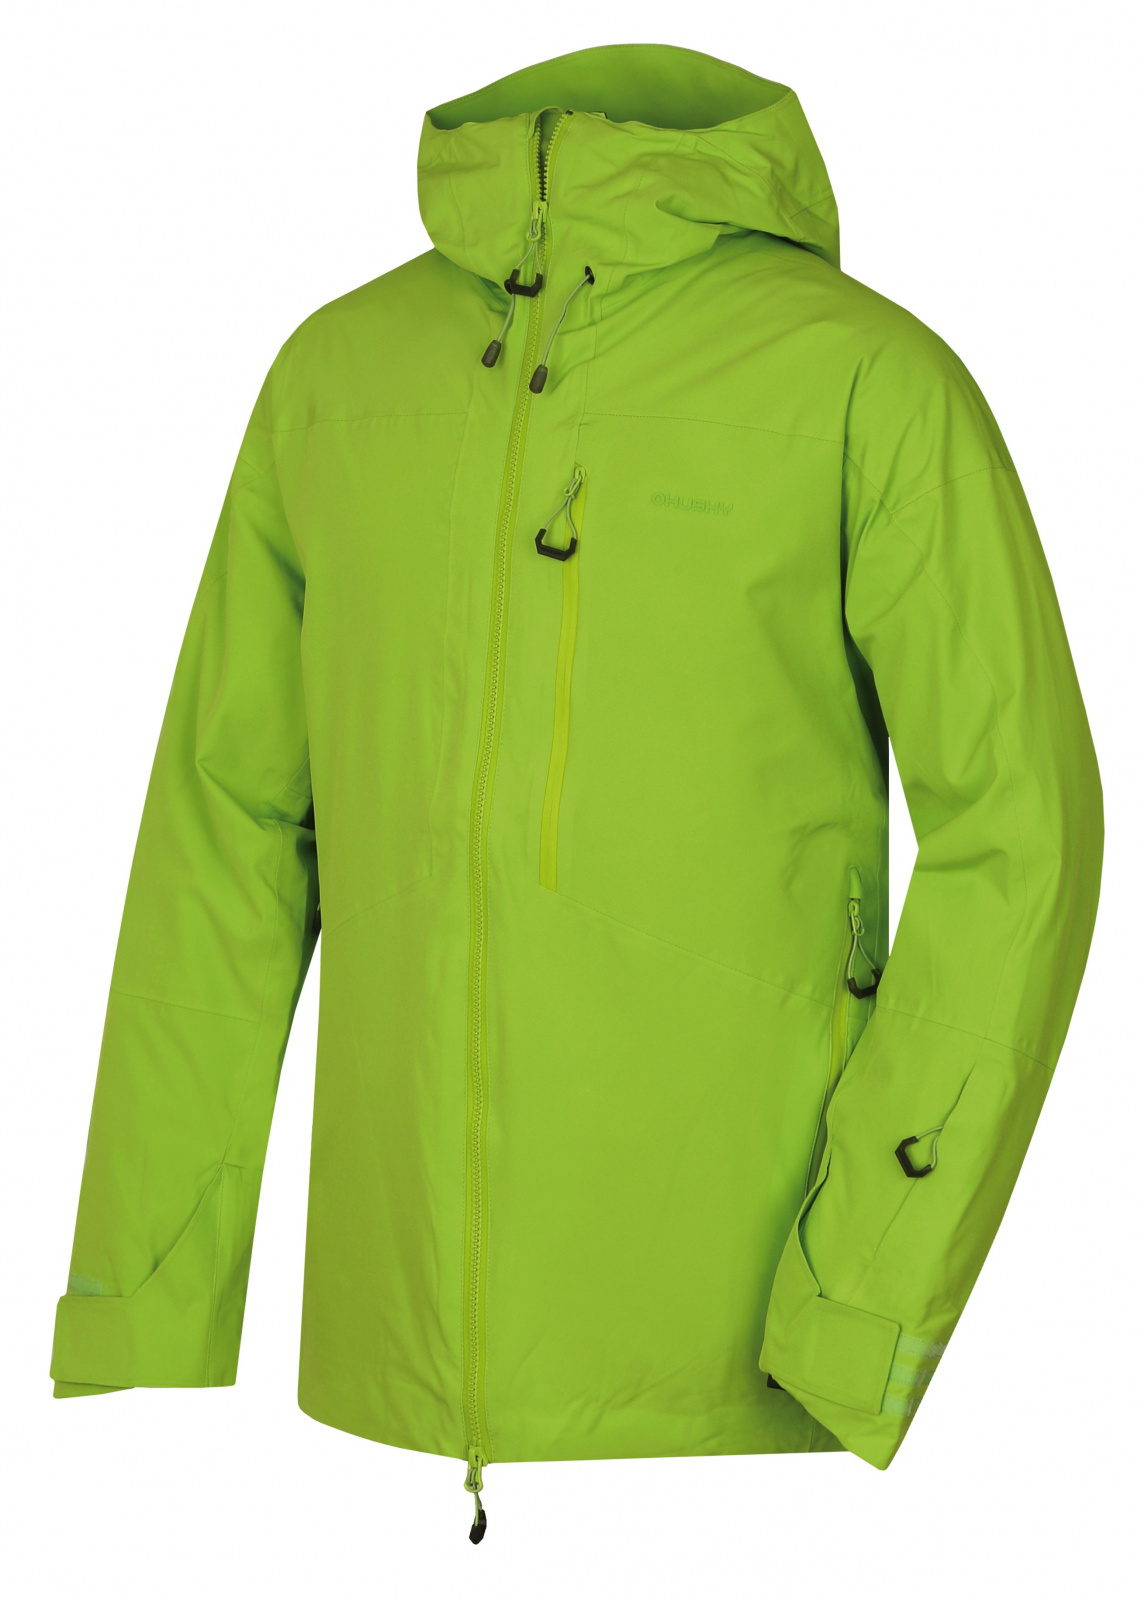 Husky Gomez M zelená, XXL Pánska lyžiarska bunda